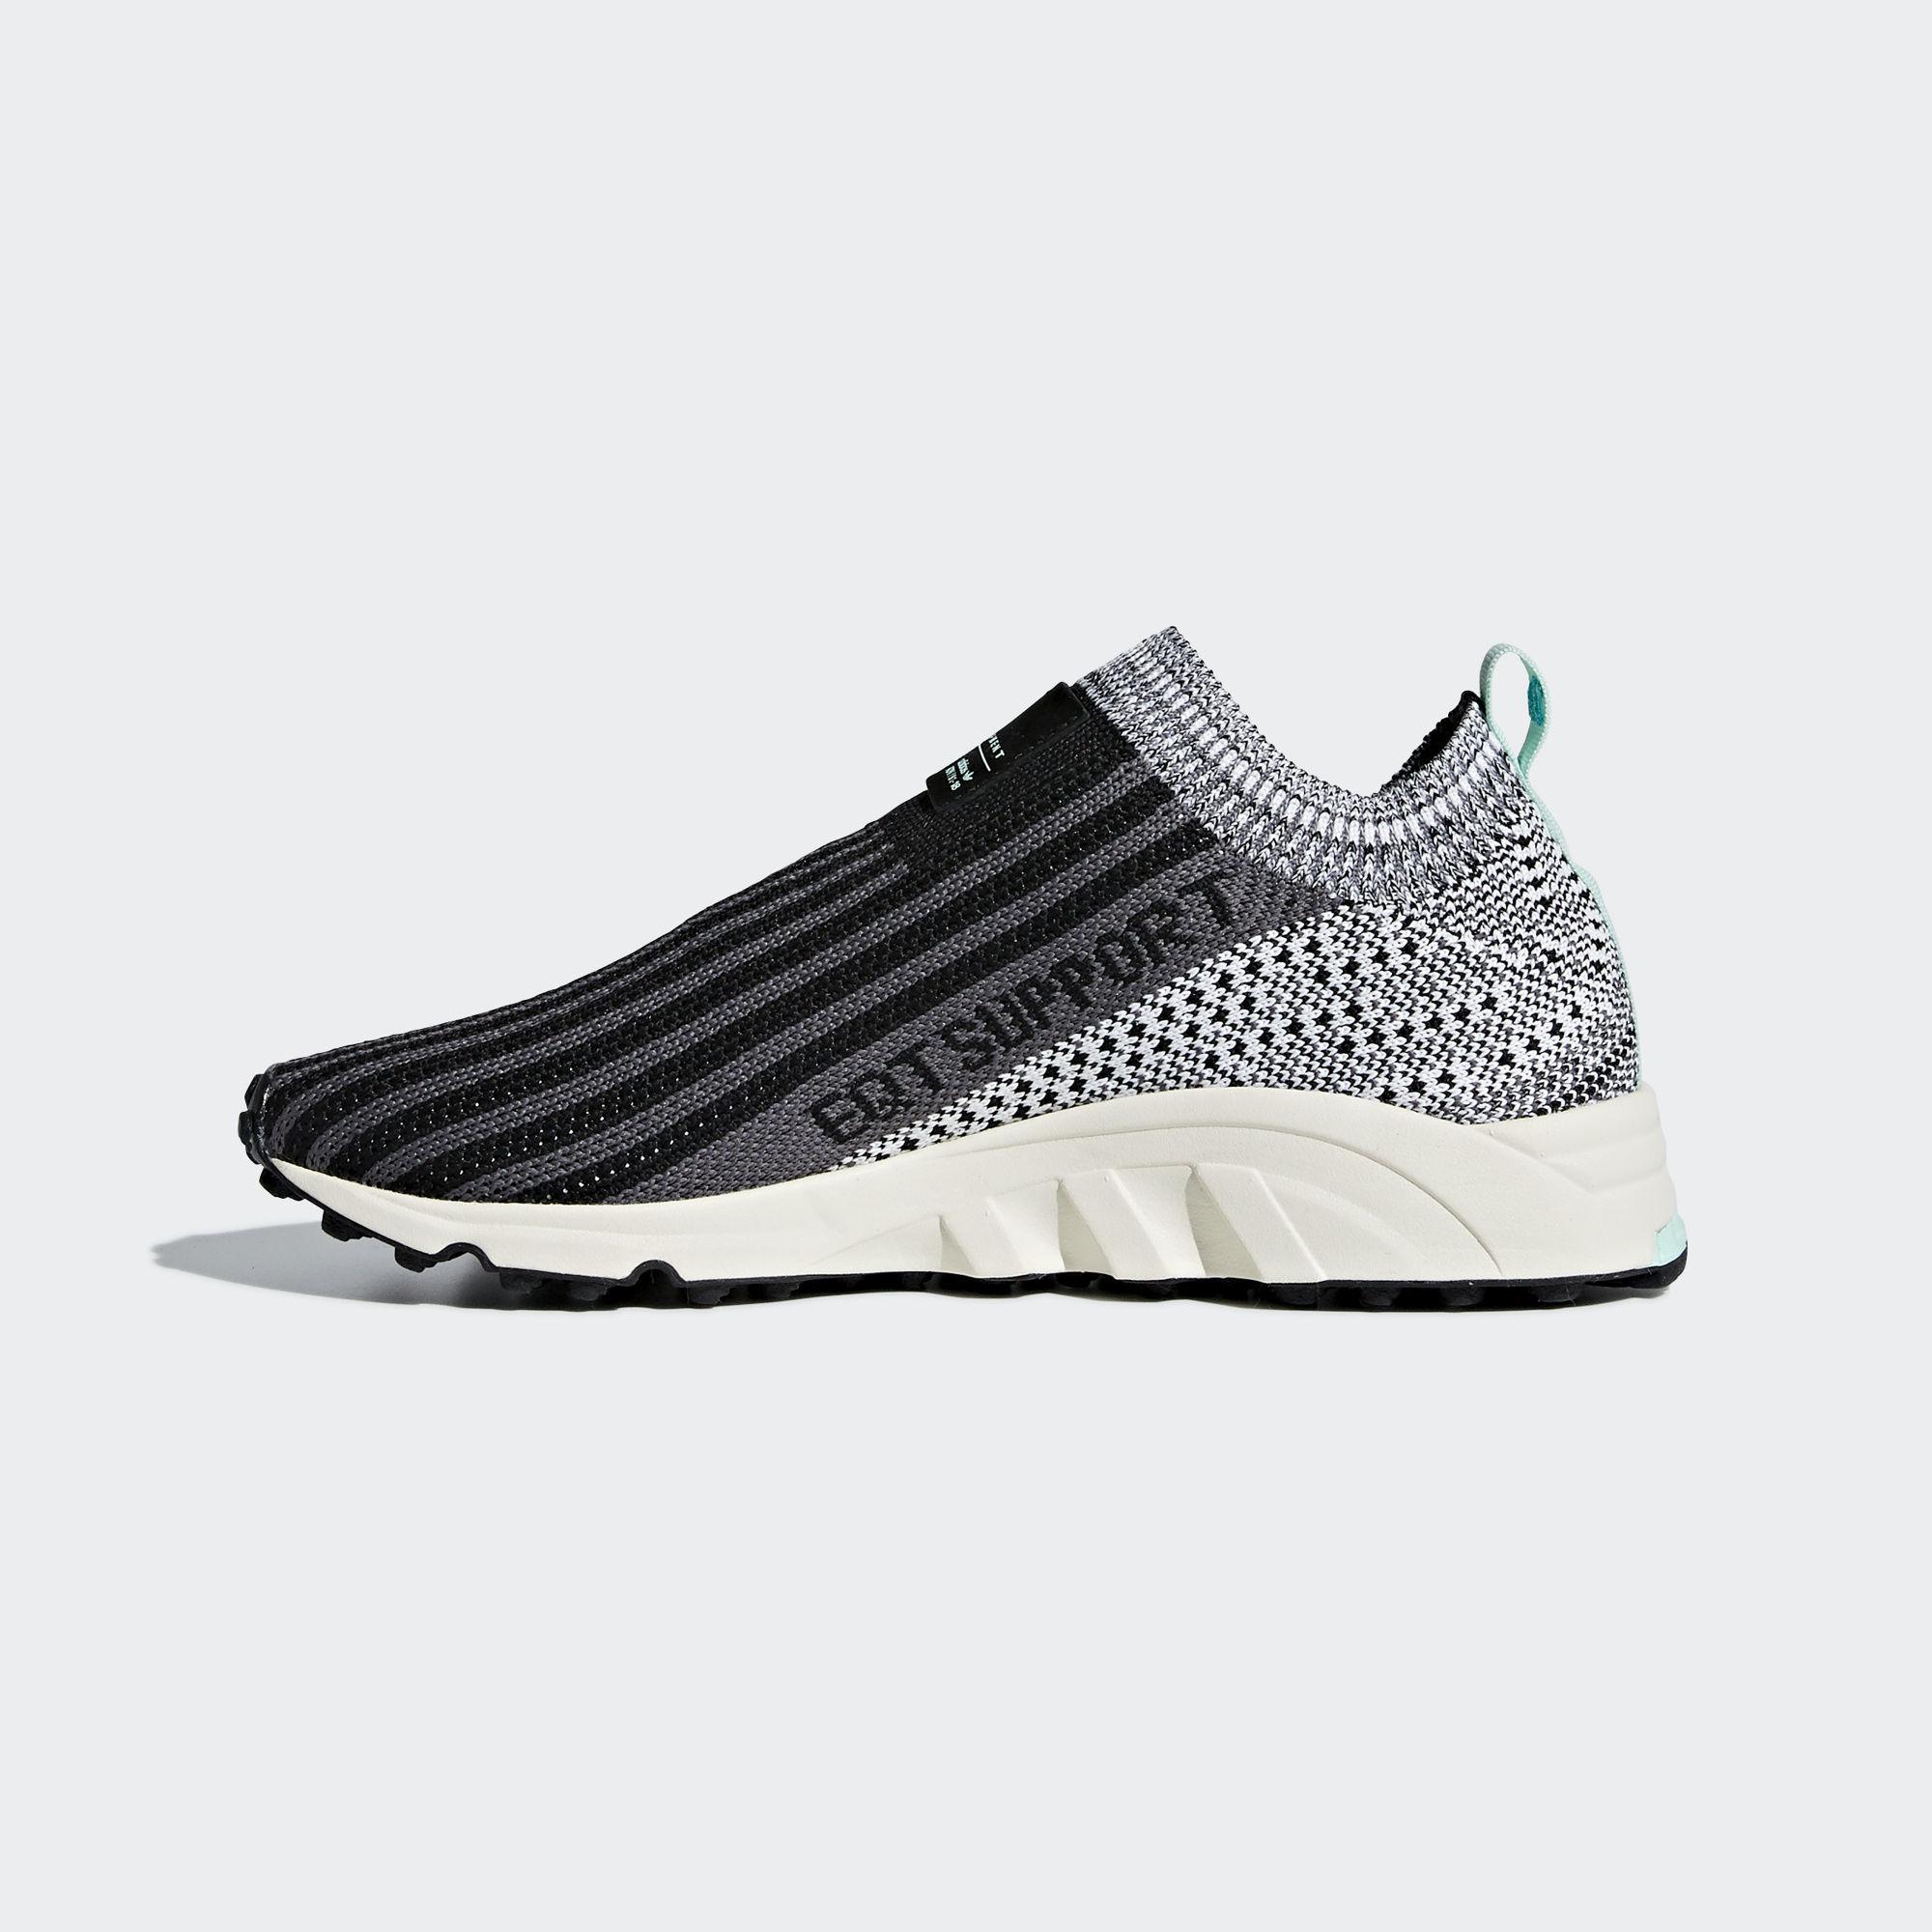 adidas EQT Support Sock Black White (B37528)